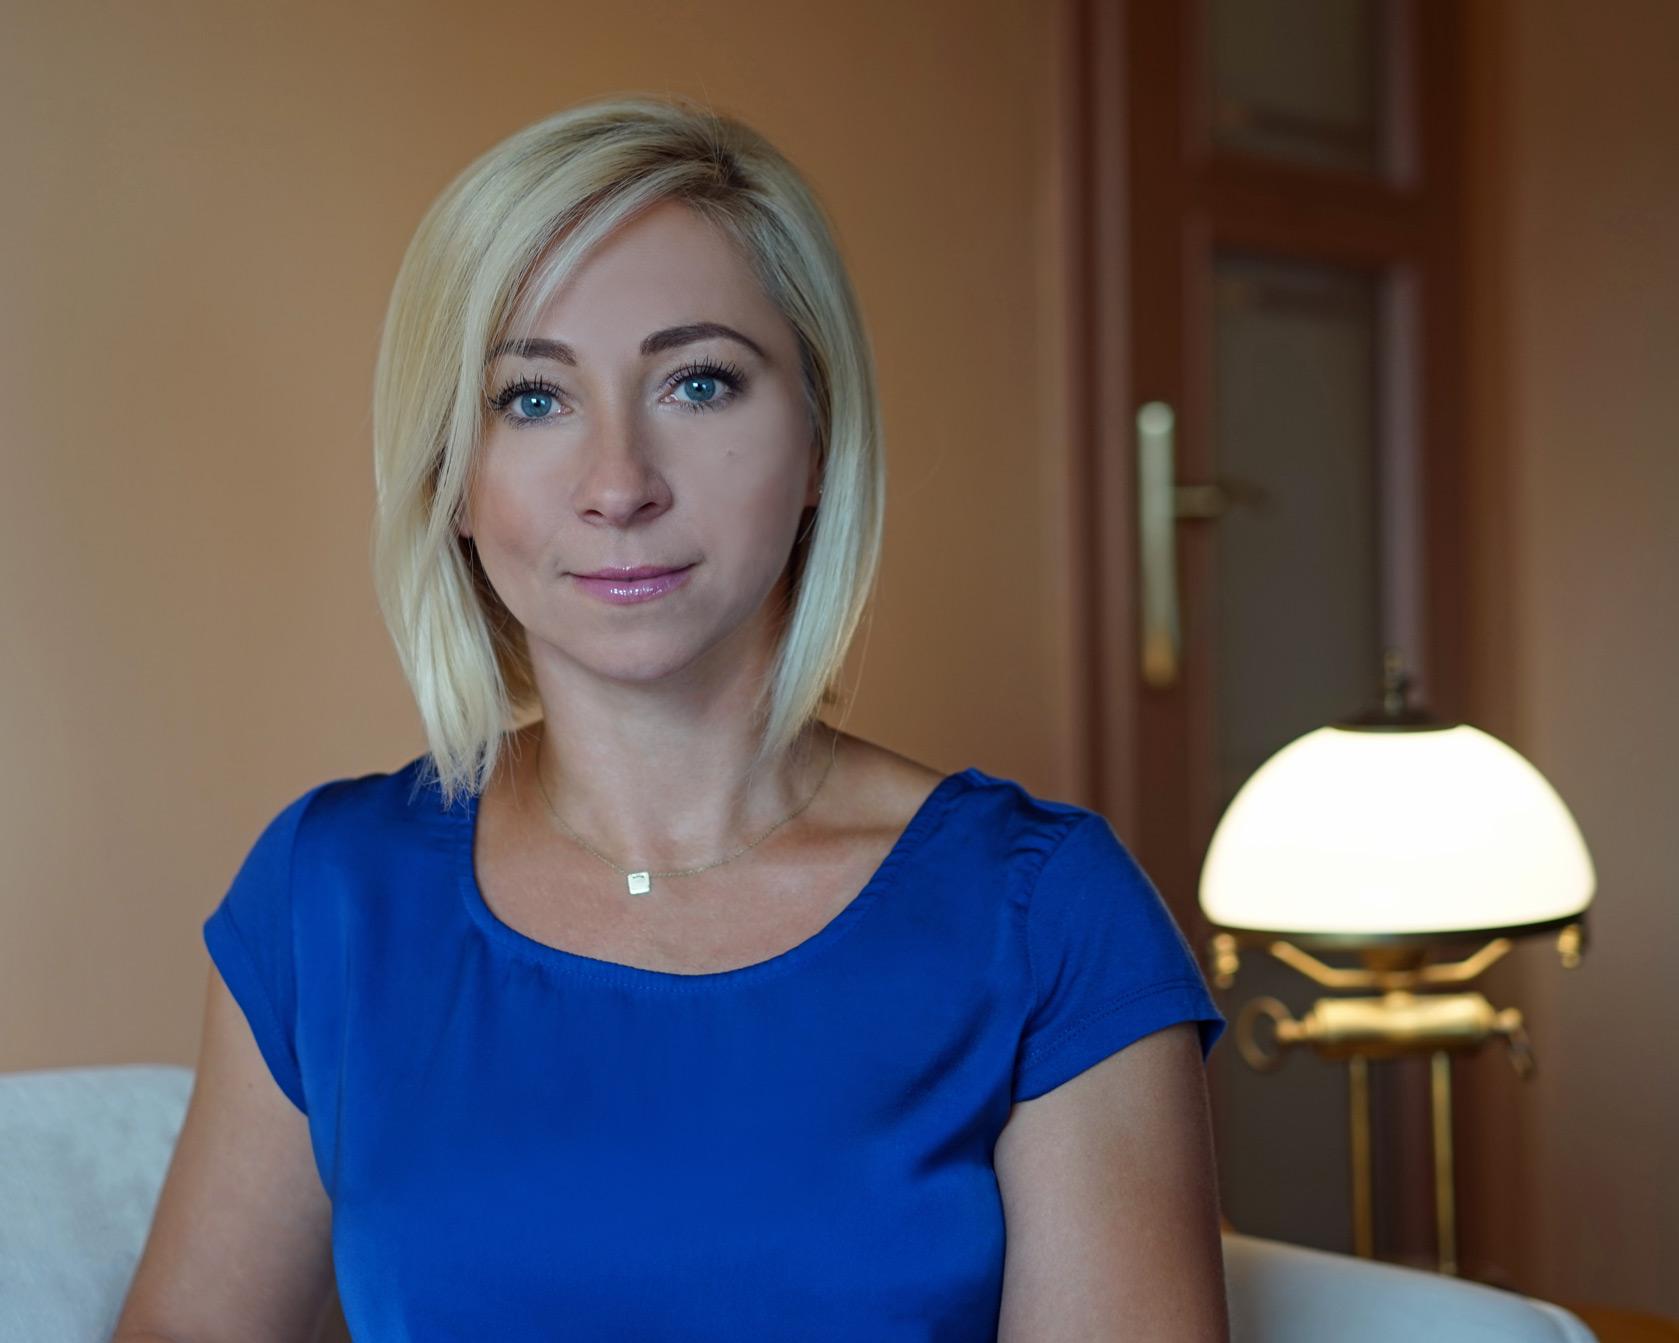 Gabinet Psychologiczny dr Kinga Sobieralska-Michalak dobry psycholog Bydgoszcz